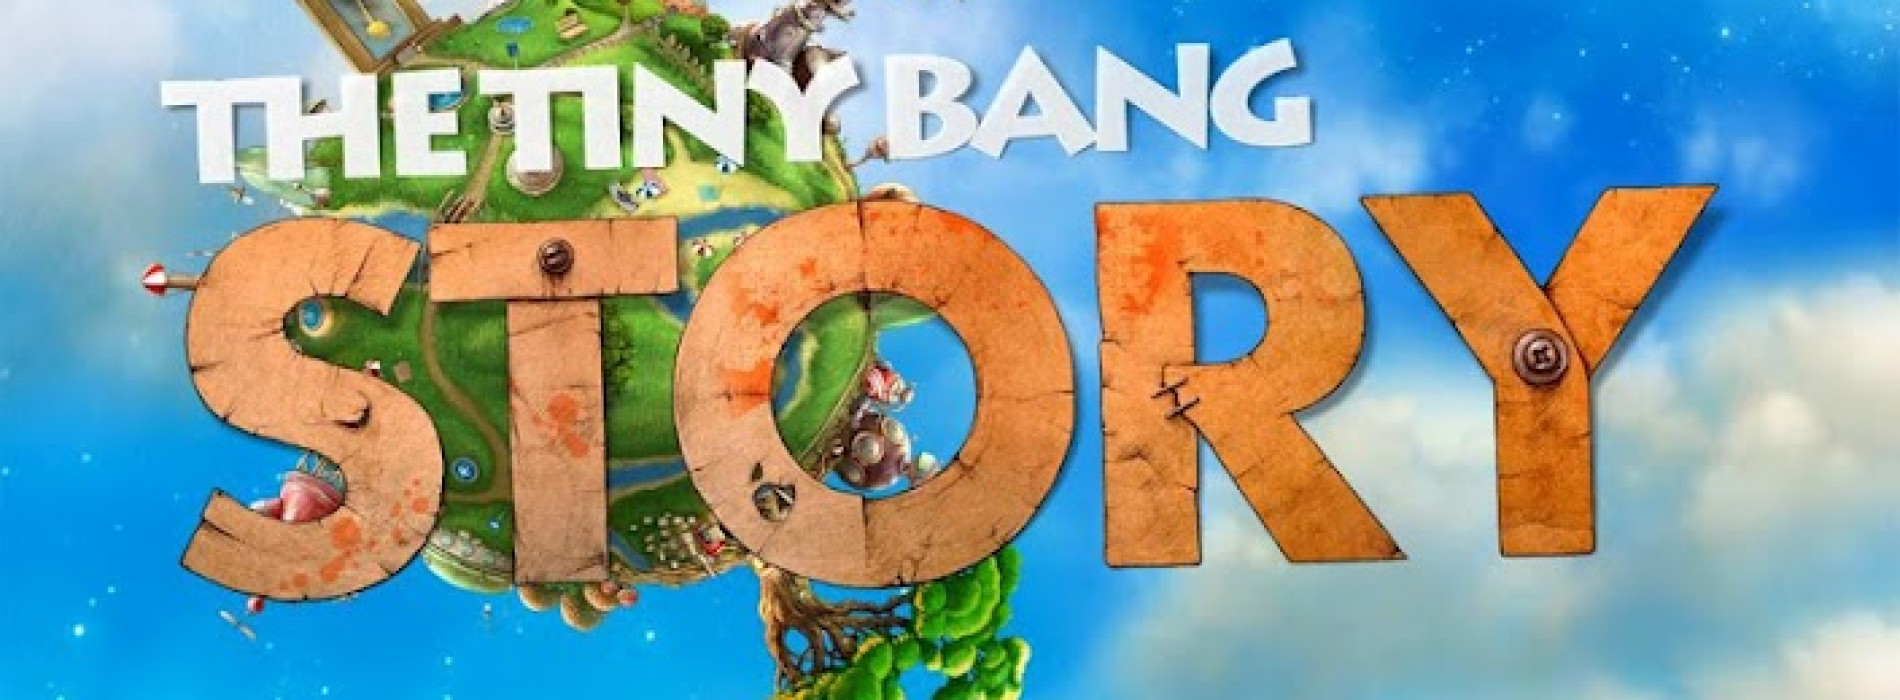 HeroCraft debuts its steampunk, fantasy puzzler The Tiny Bang Story